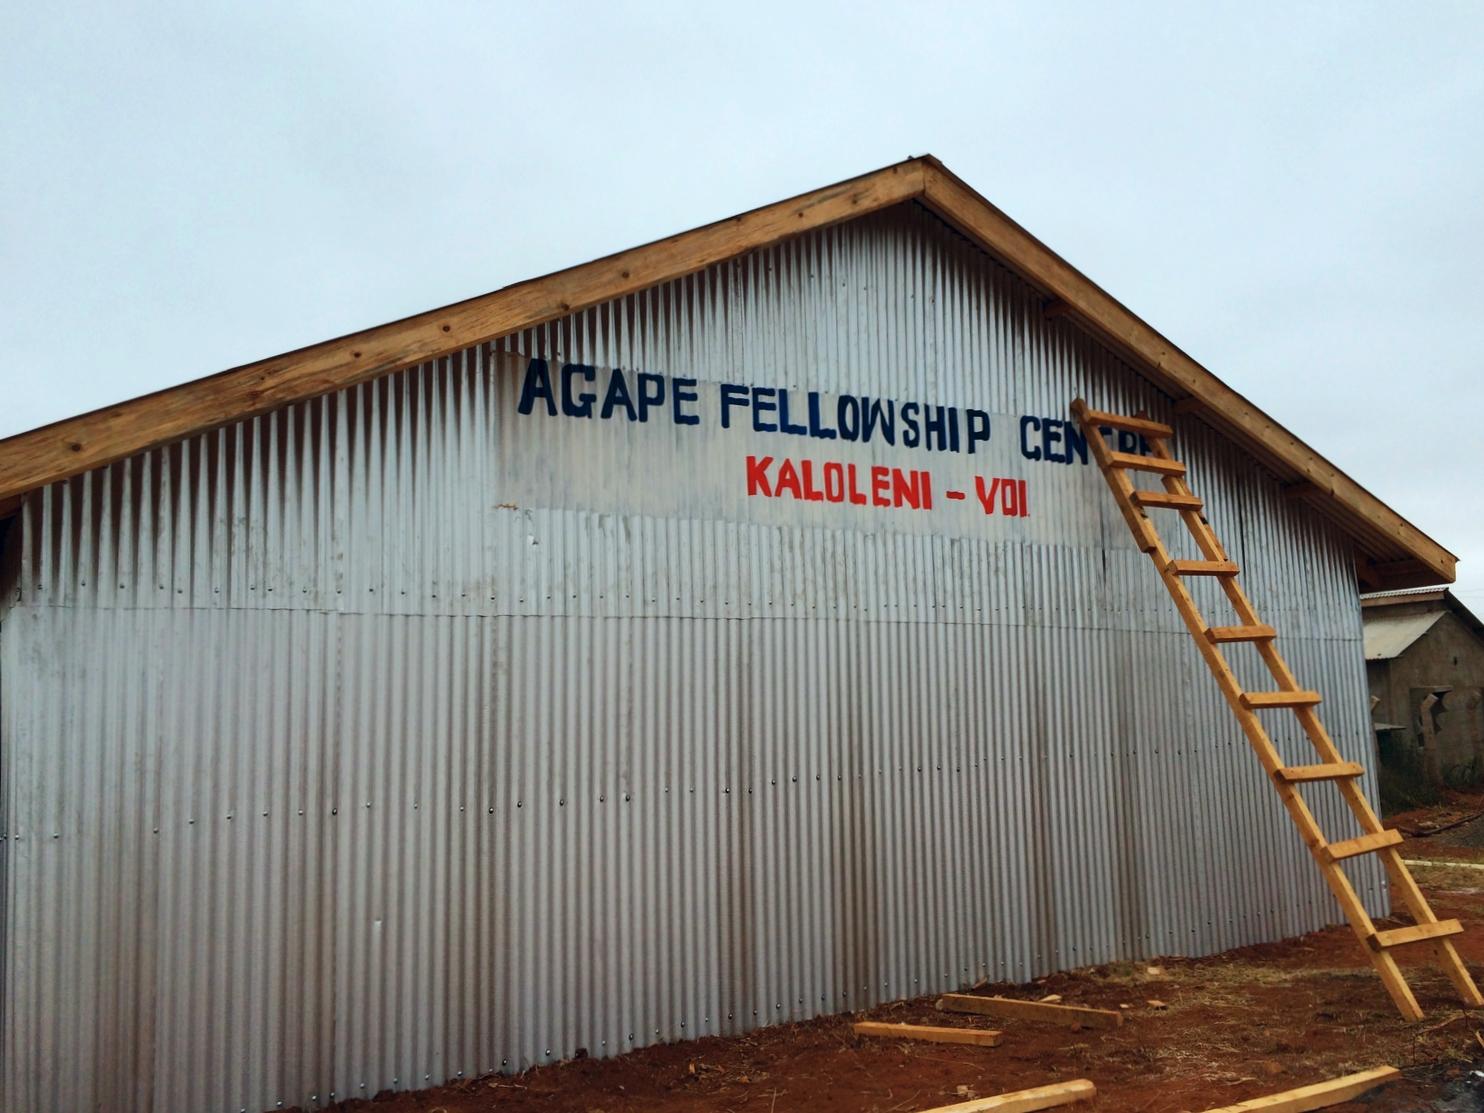 2015 Voi, church building